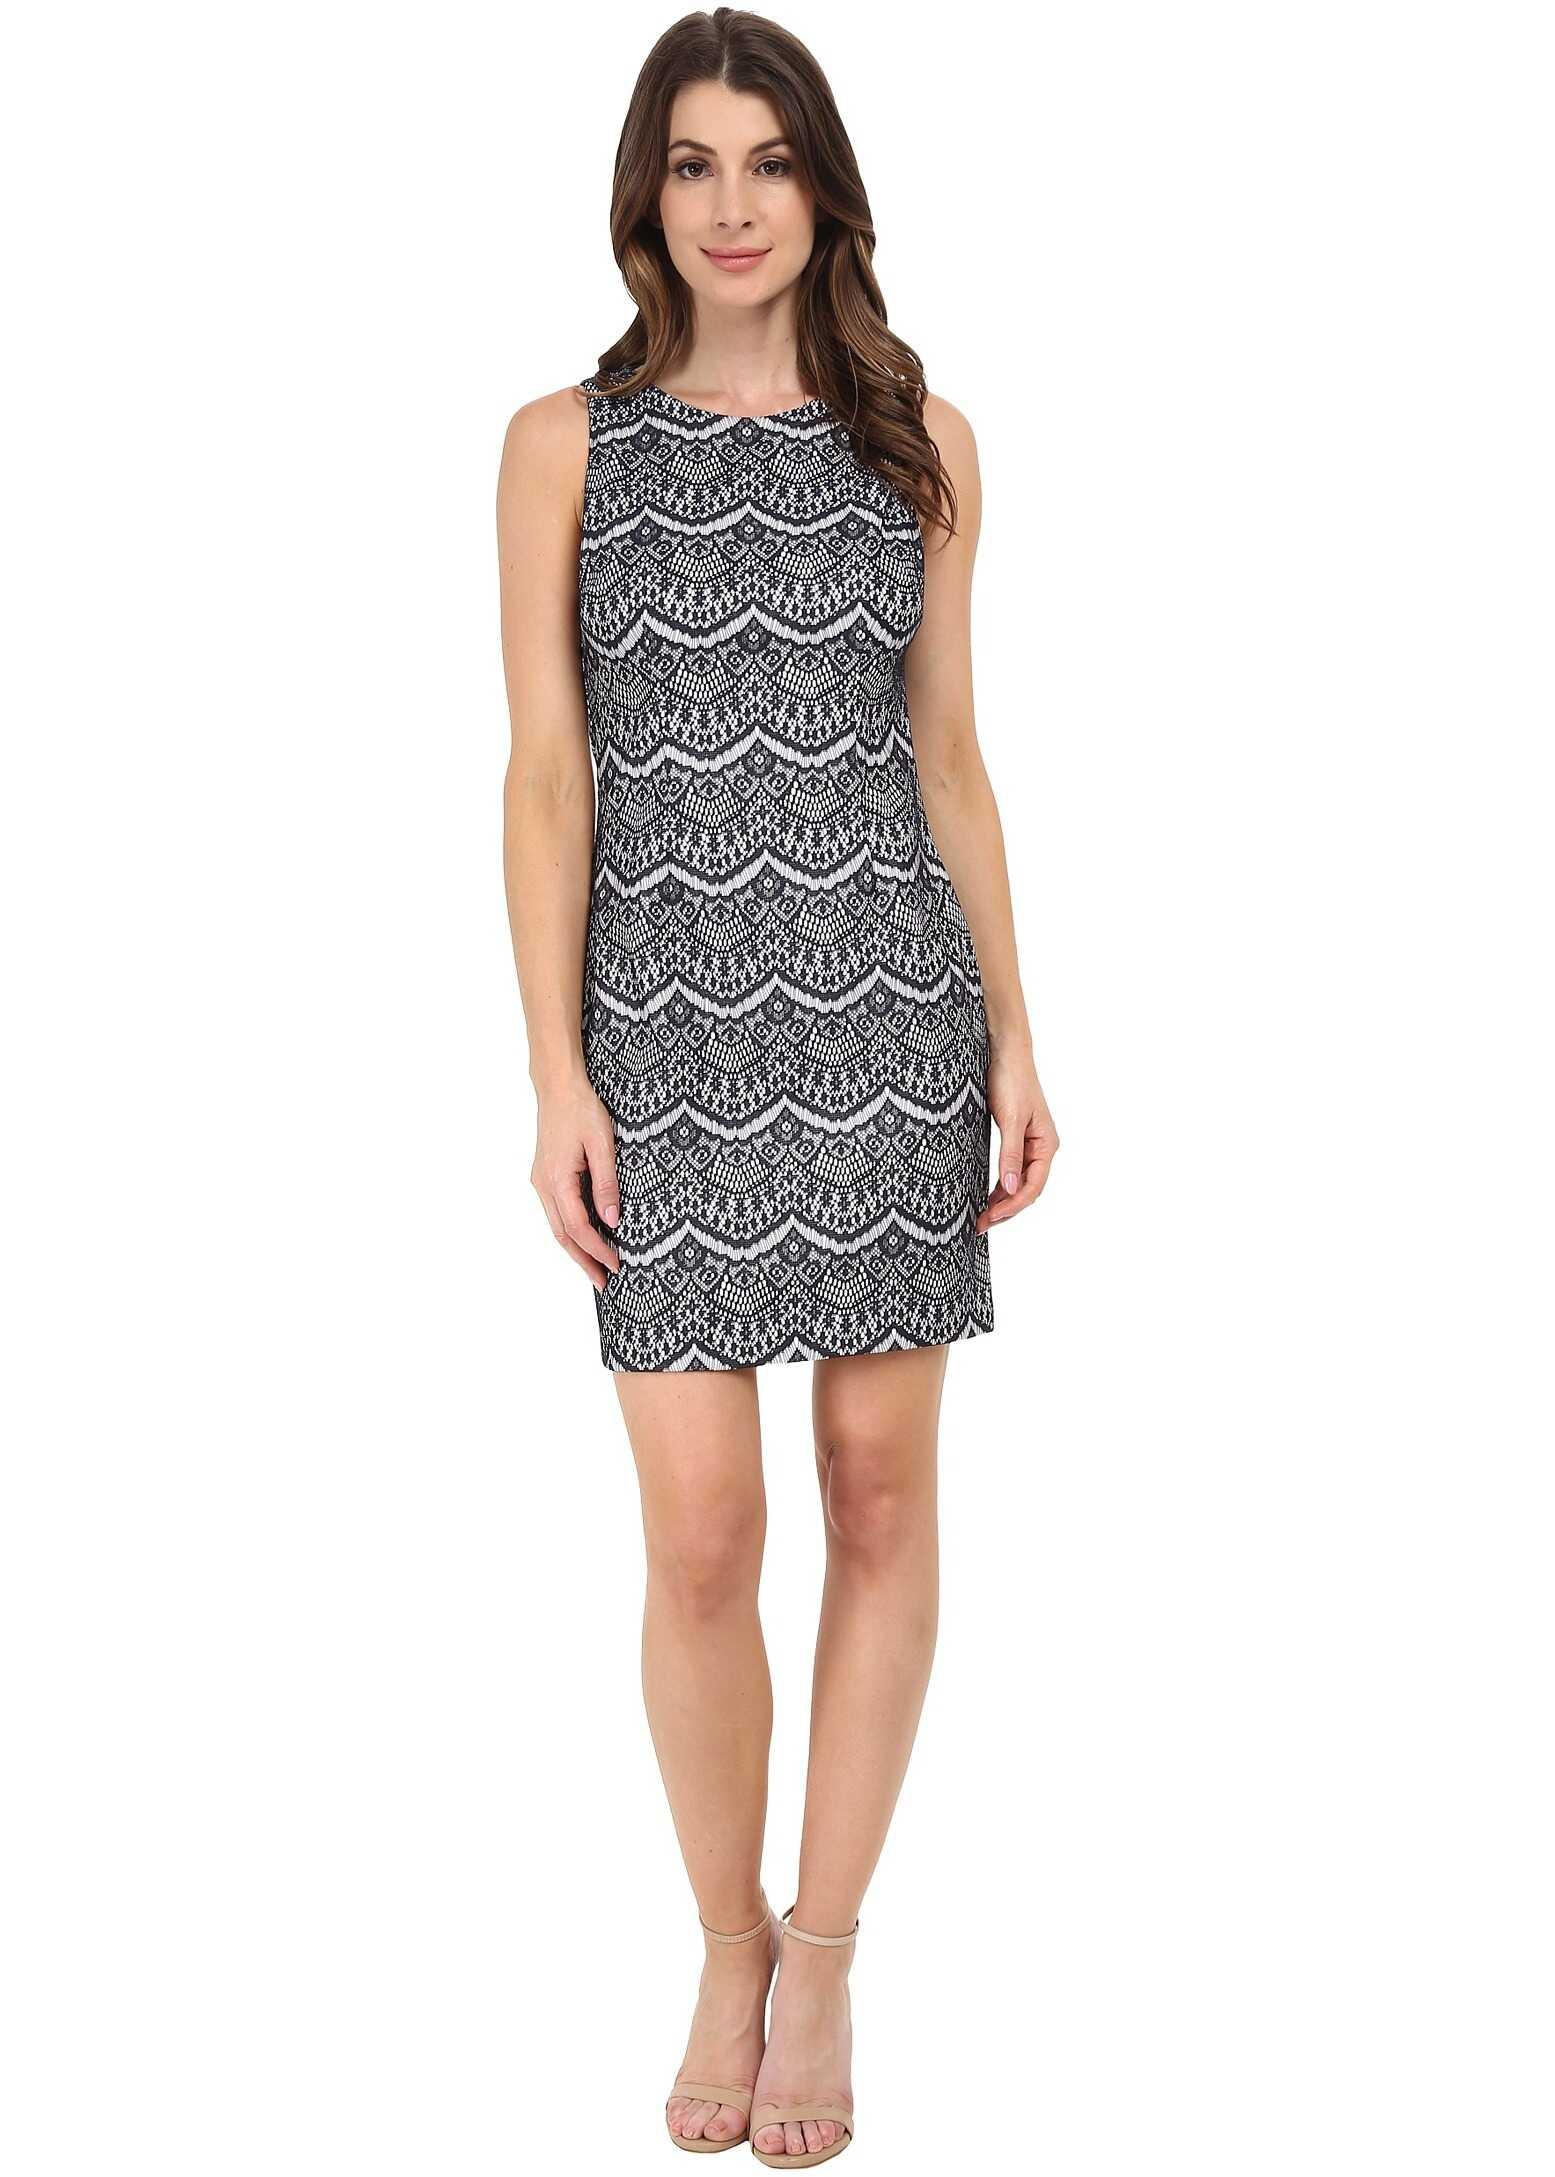 Jessica Simpson Lace Sheath Dress Navy/Ivory